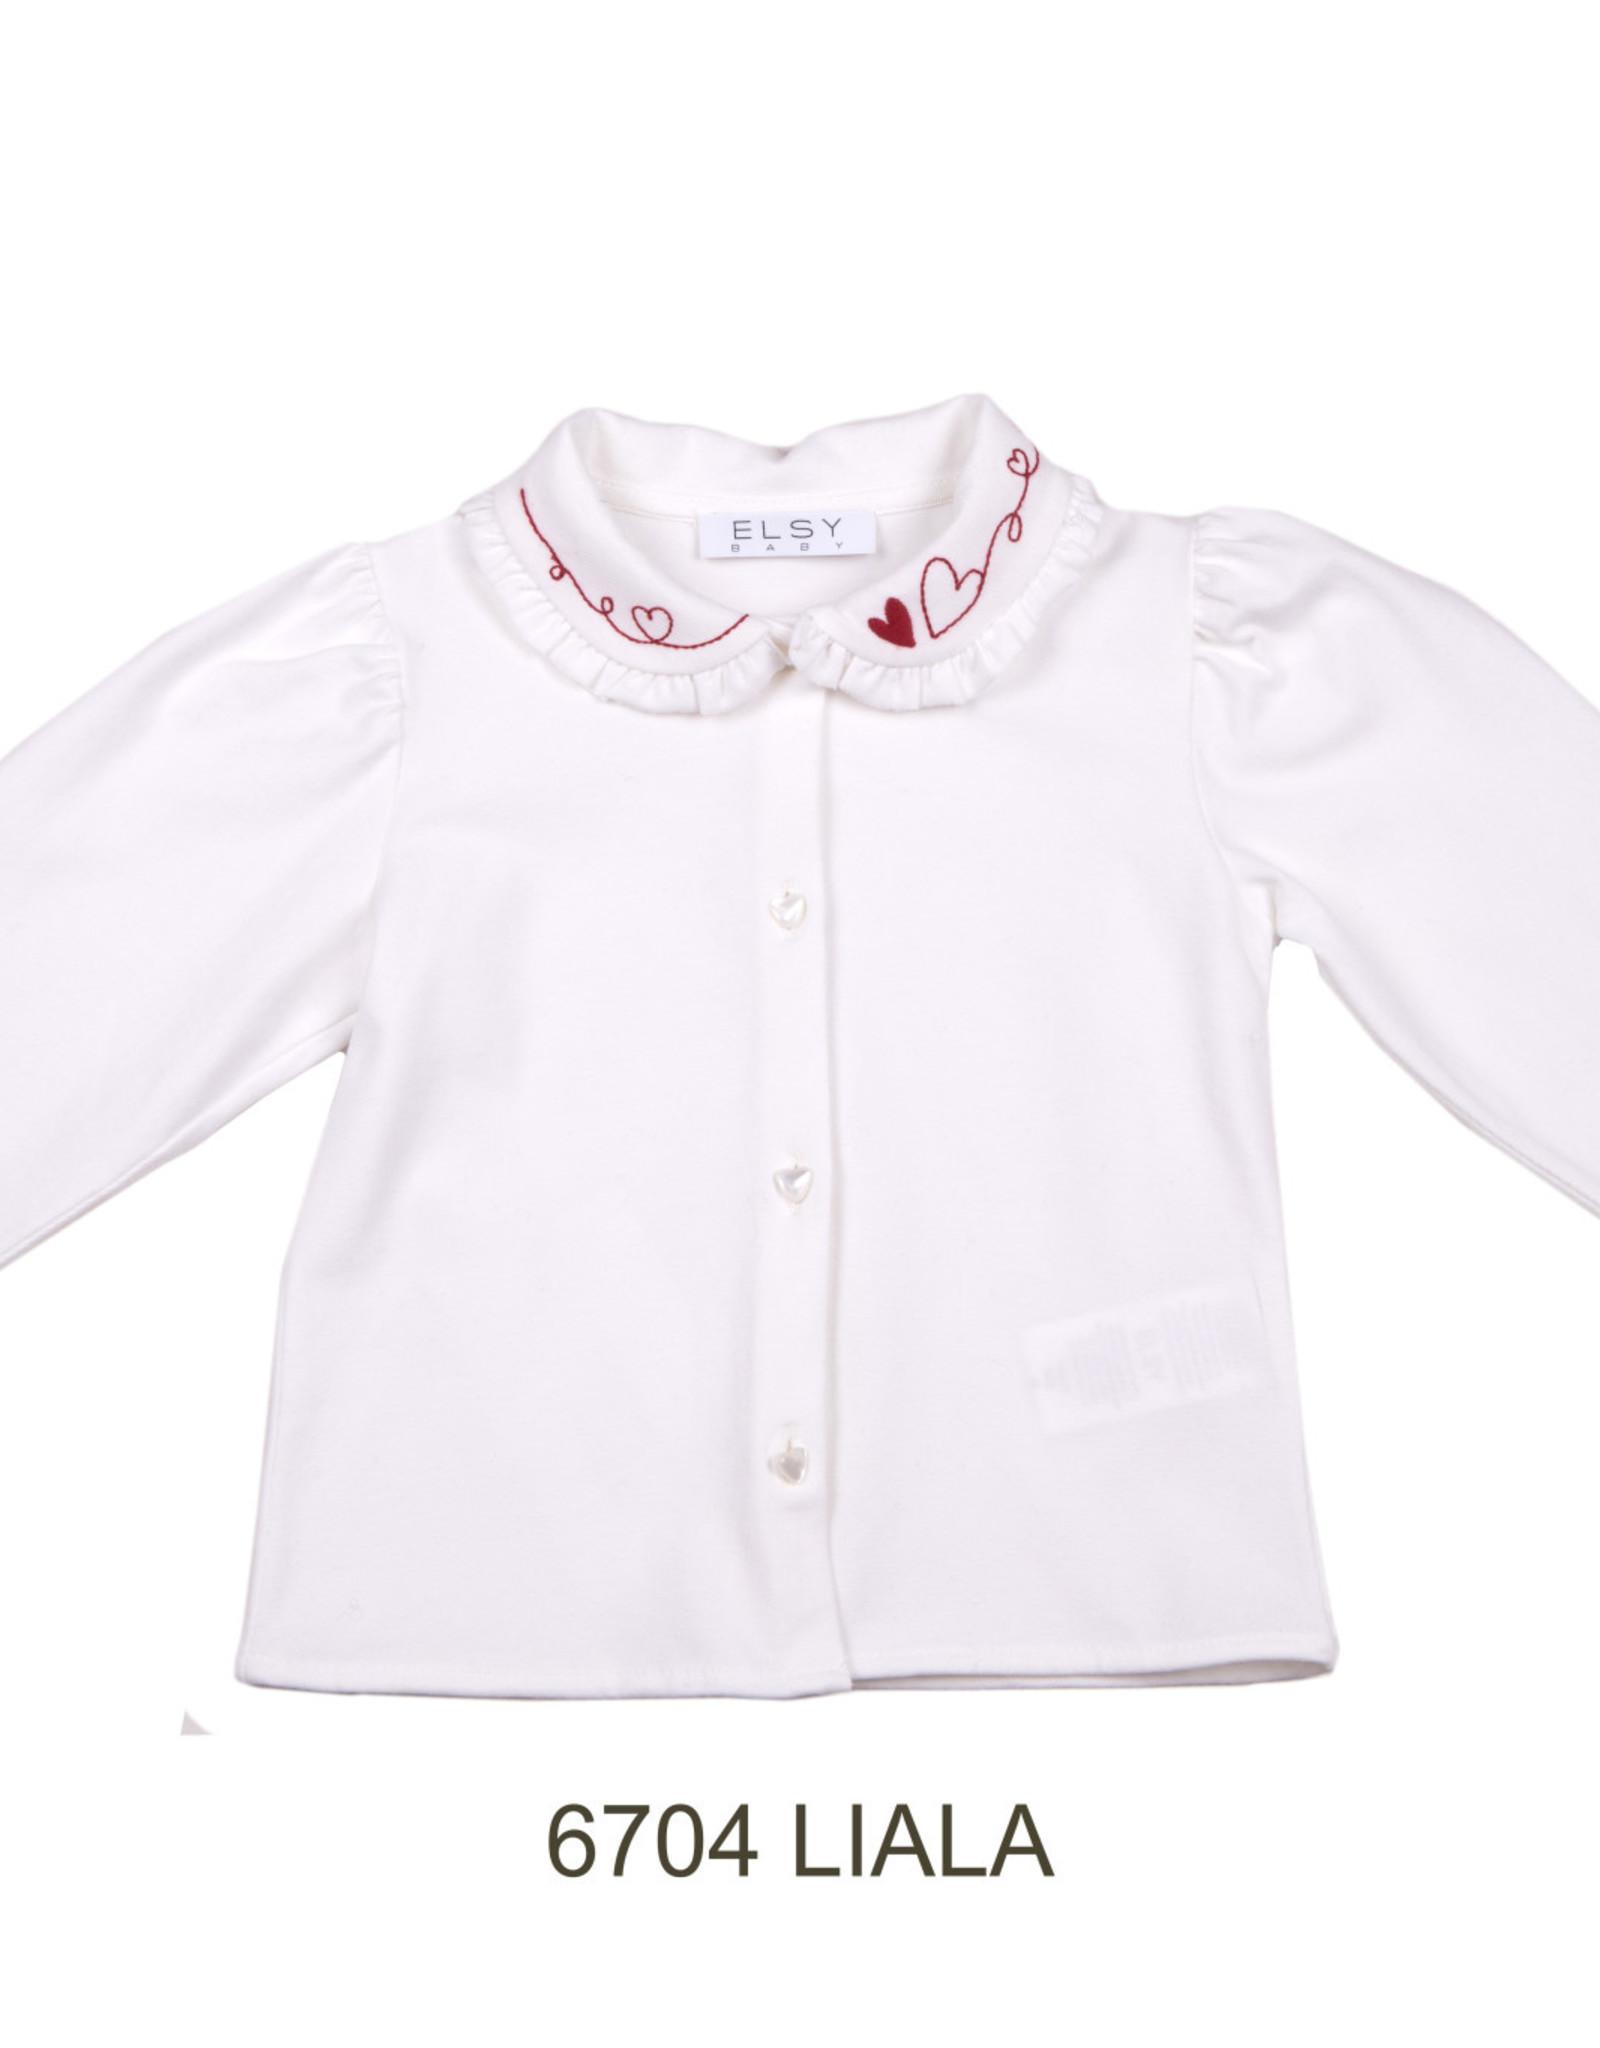 ELSY Liala Camicia Jersey Yogurt